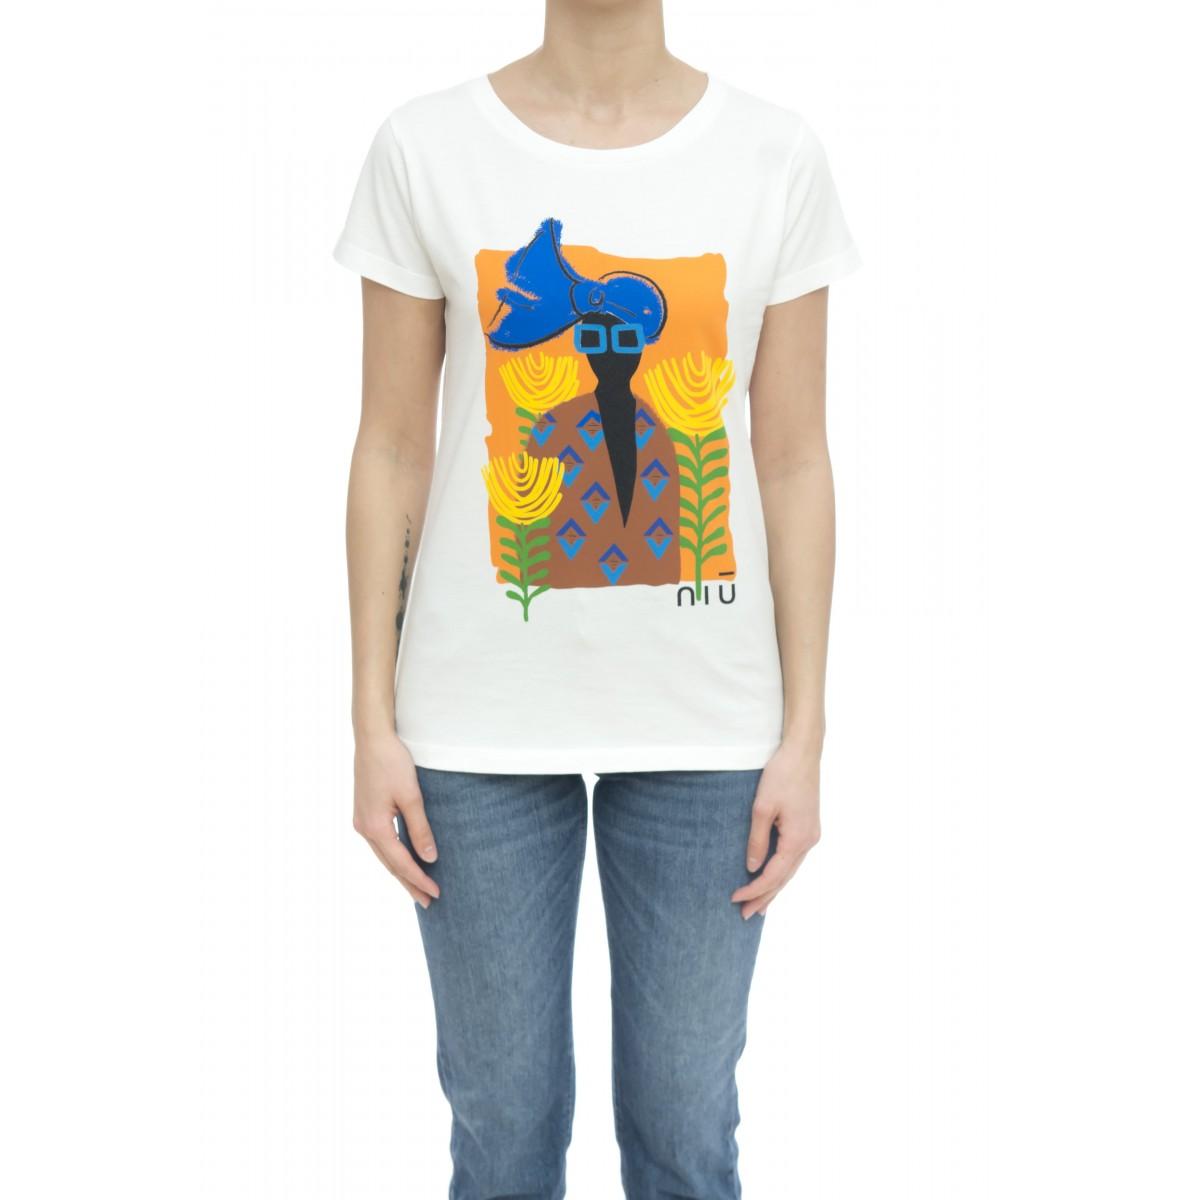 T-shirt - 593 j03 t-shirt stampa